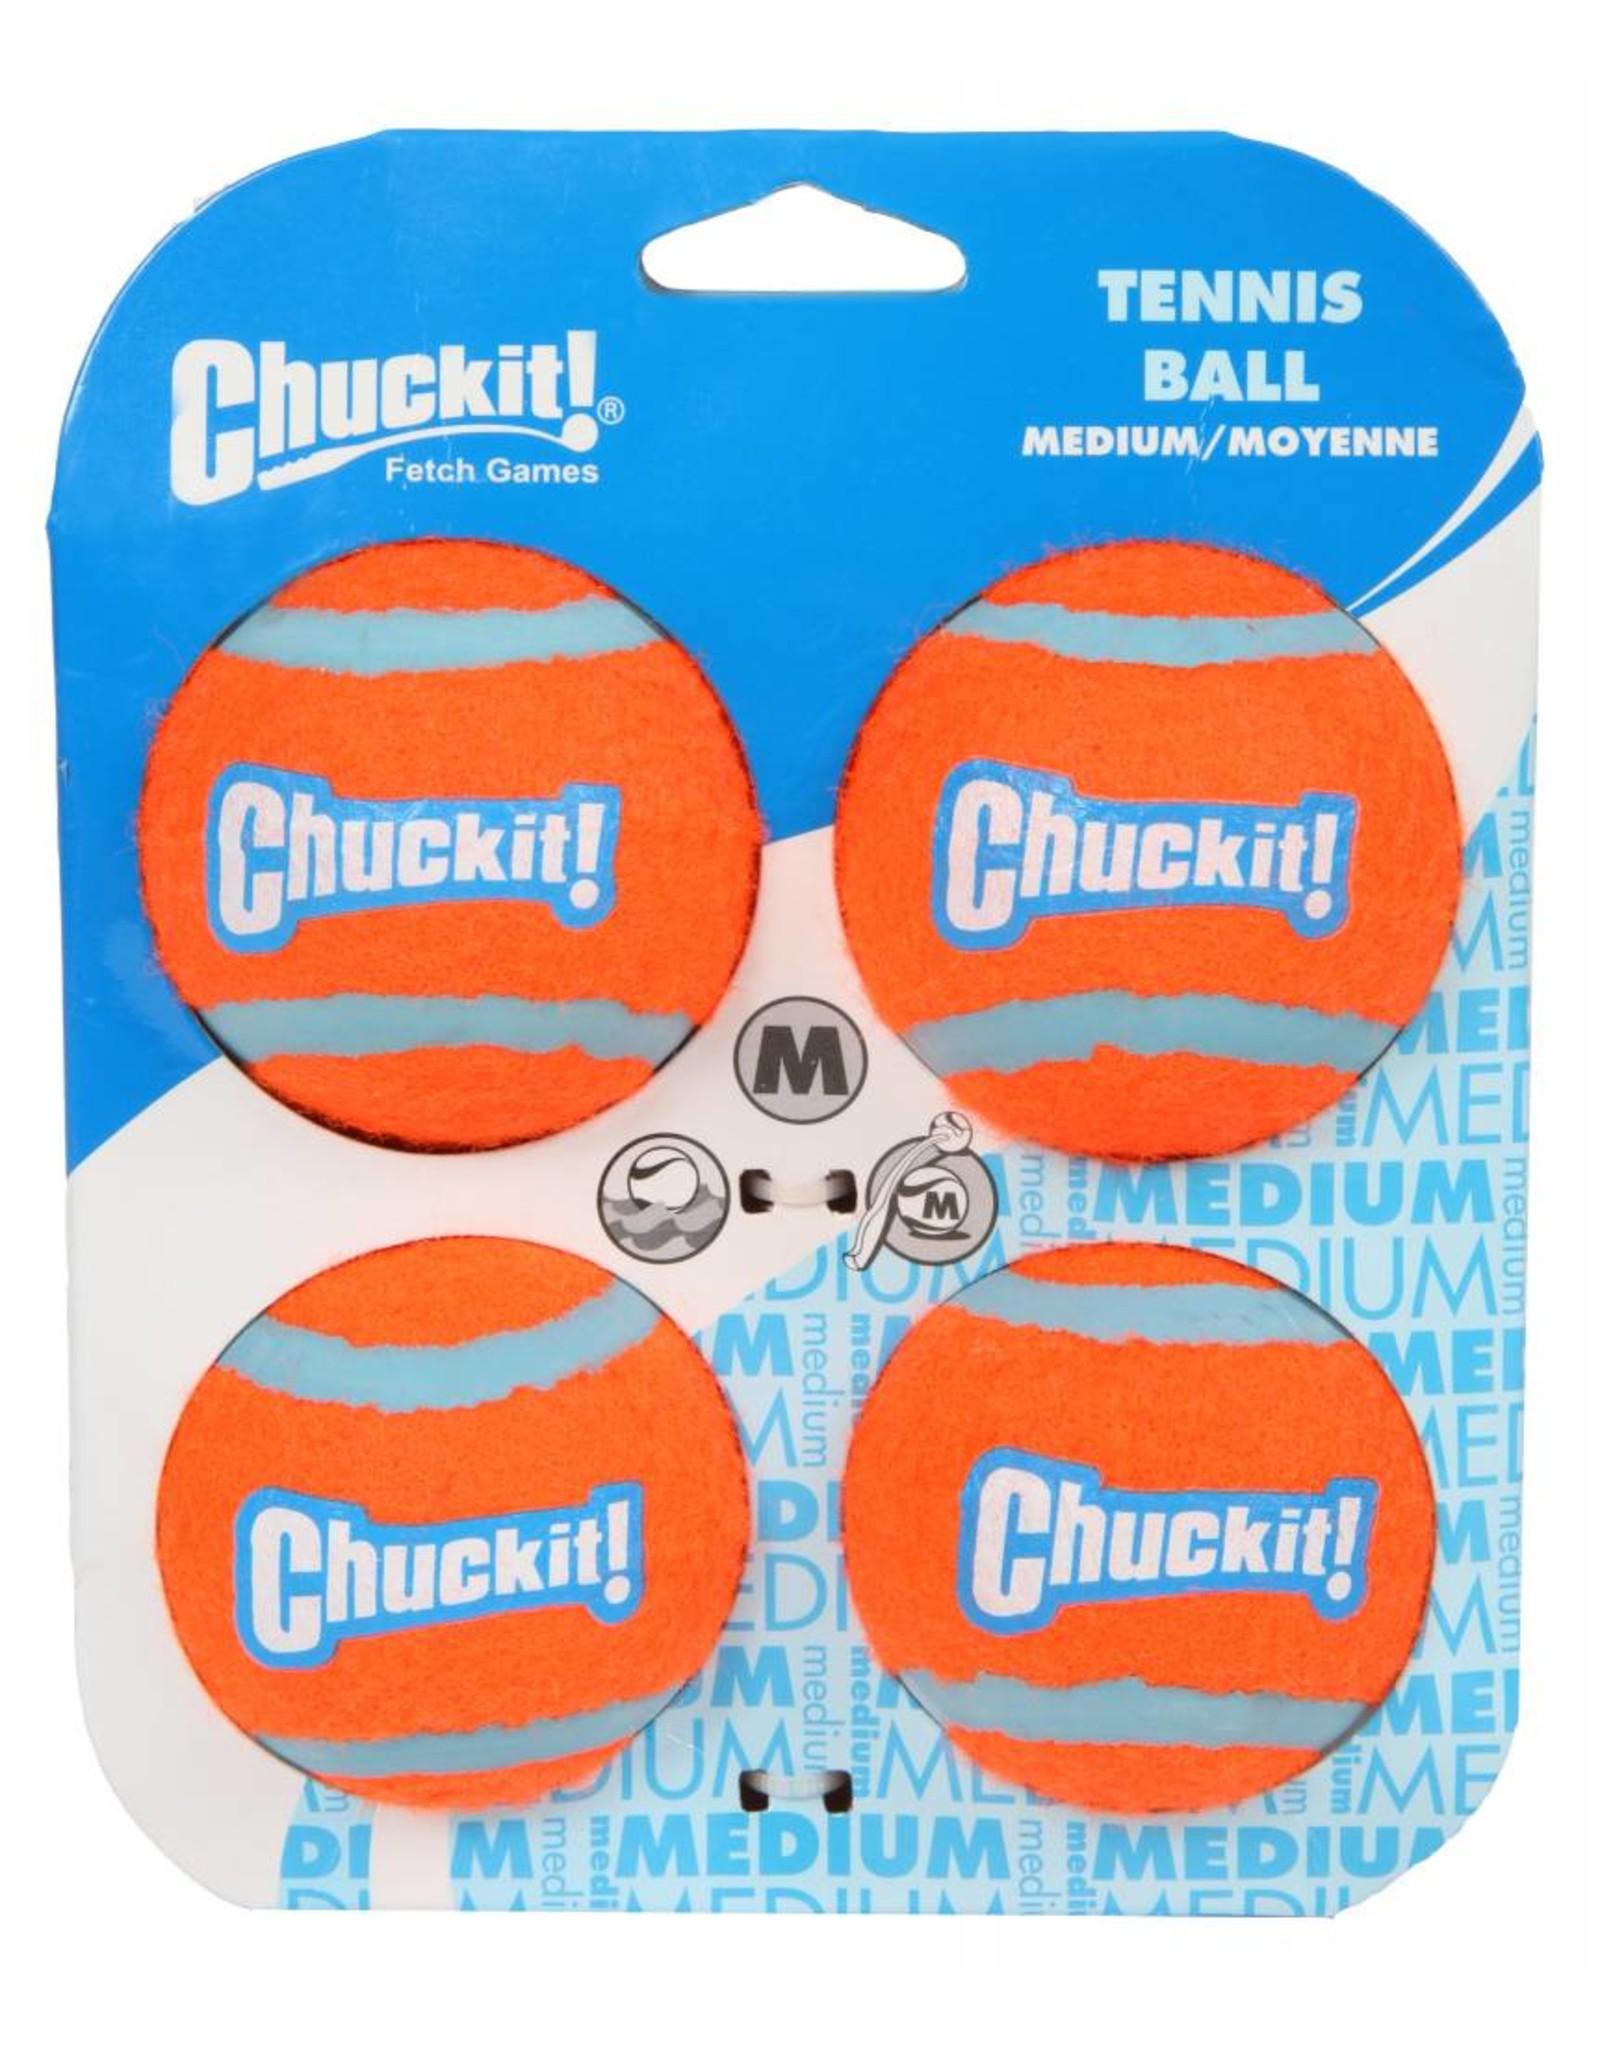 Chuckit Tennis Ball Dog Toy, Medium 6.5cm, 4 pack